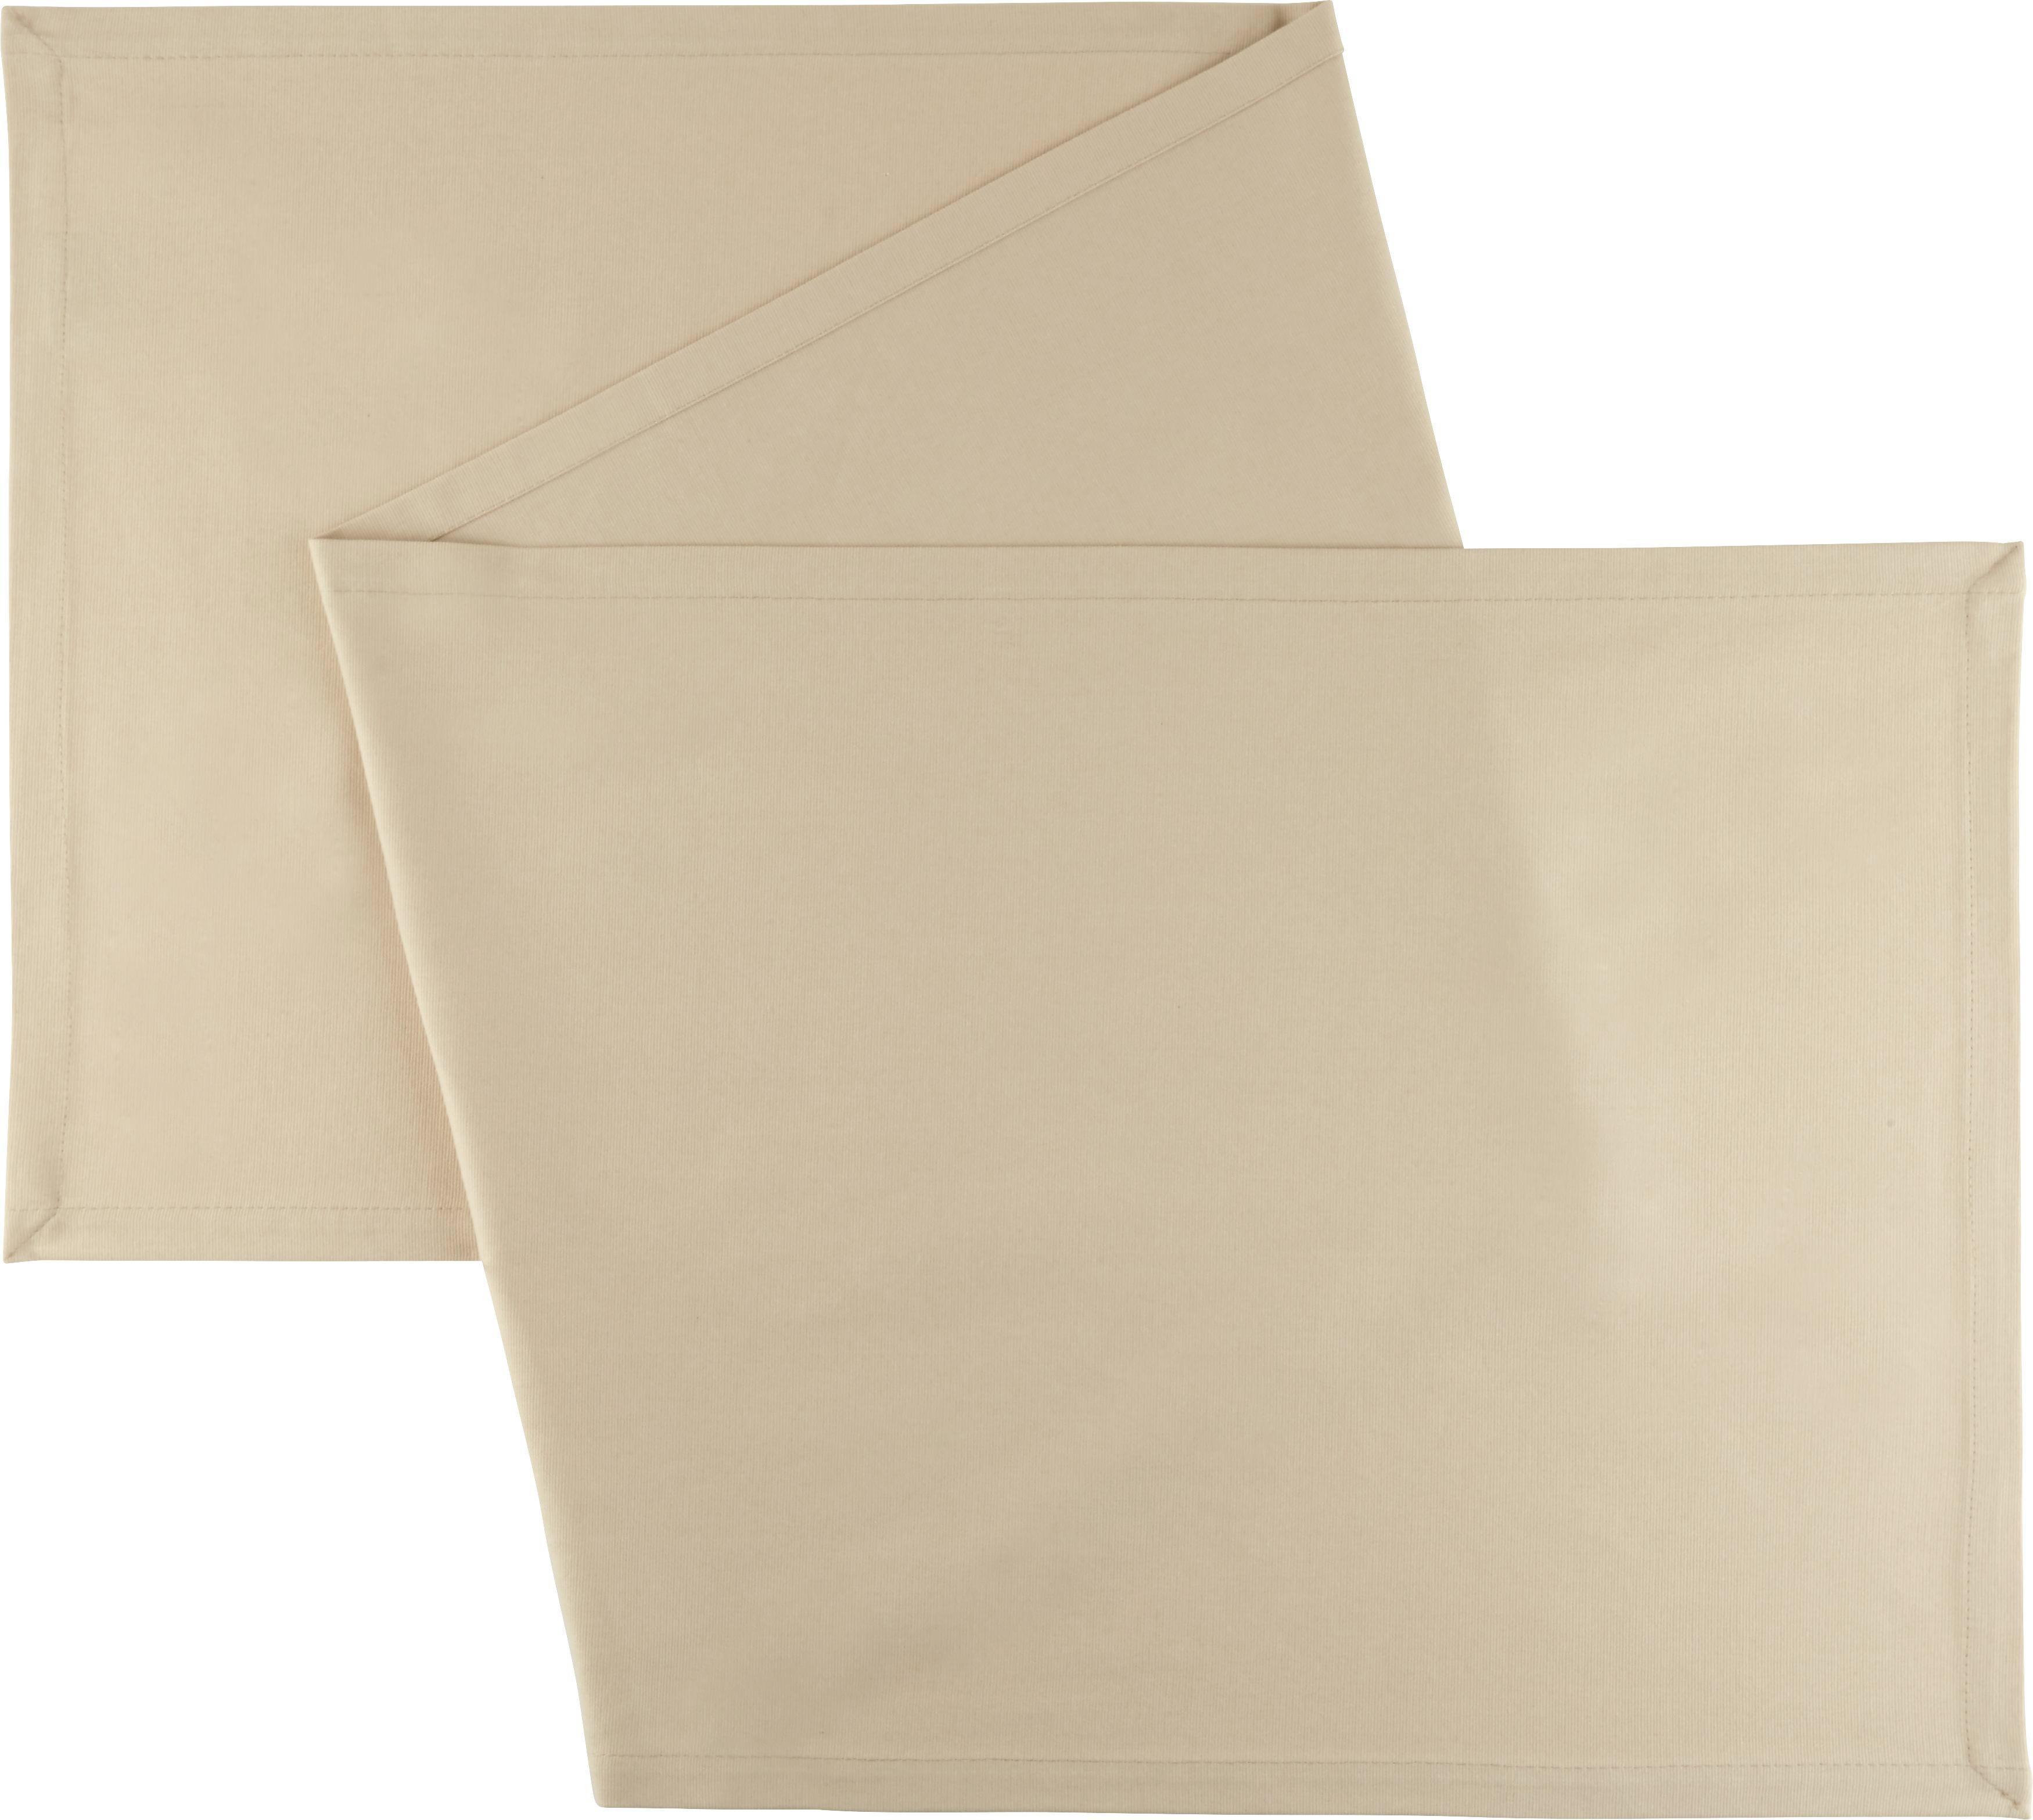 Nadprt Steffi Überlänge - naravna, tekstil (45/240cm) - MÖMAX modern living